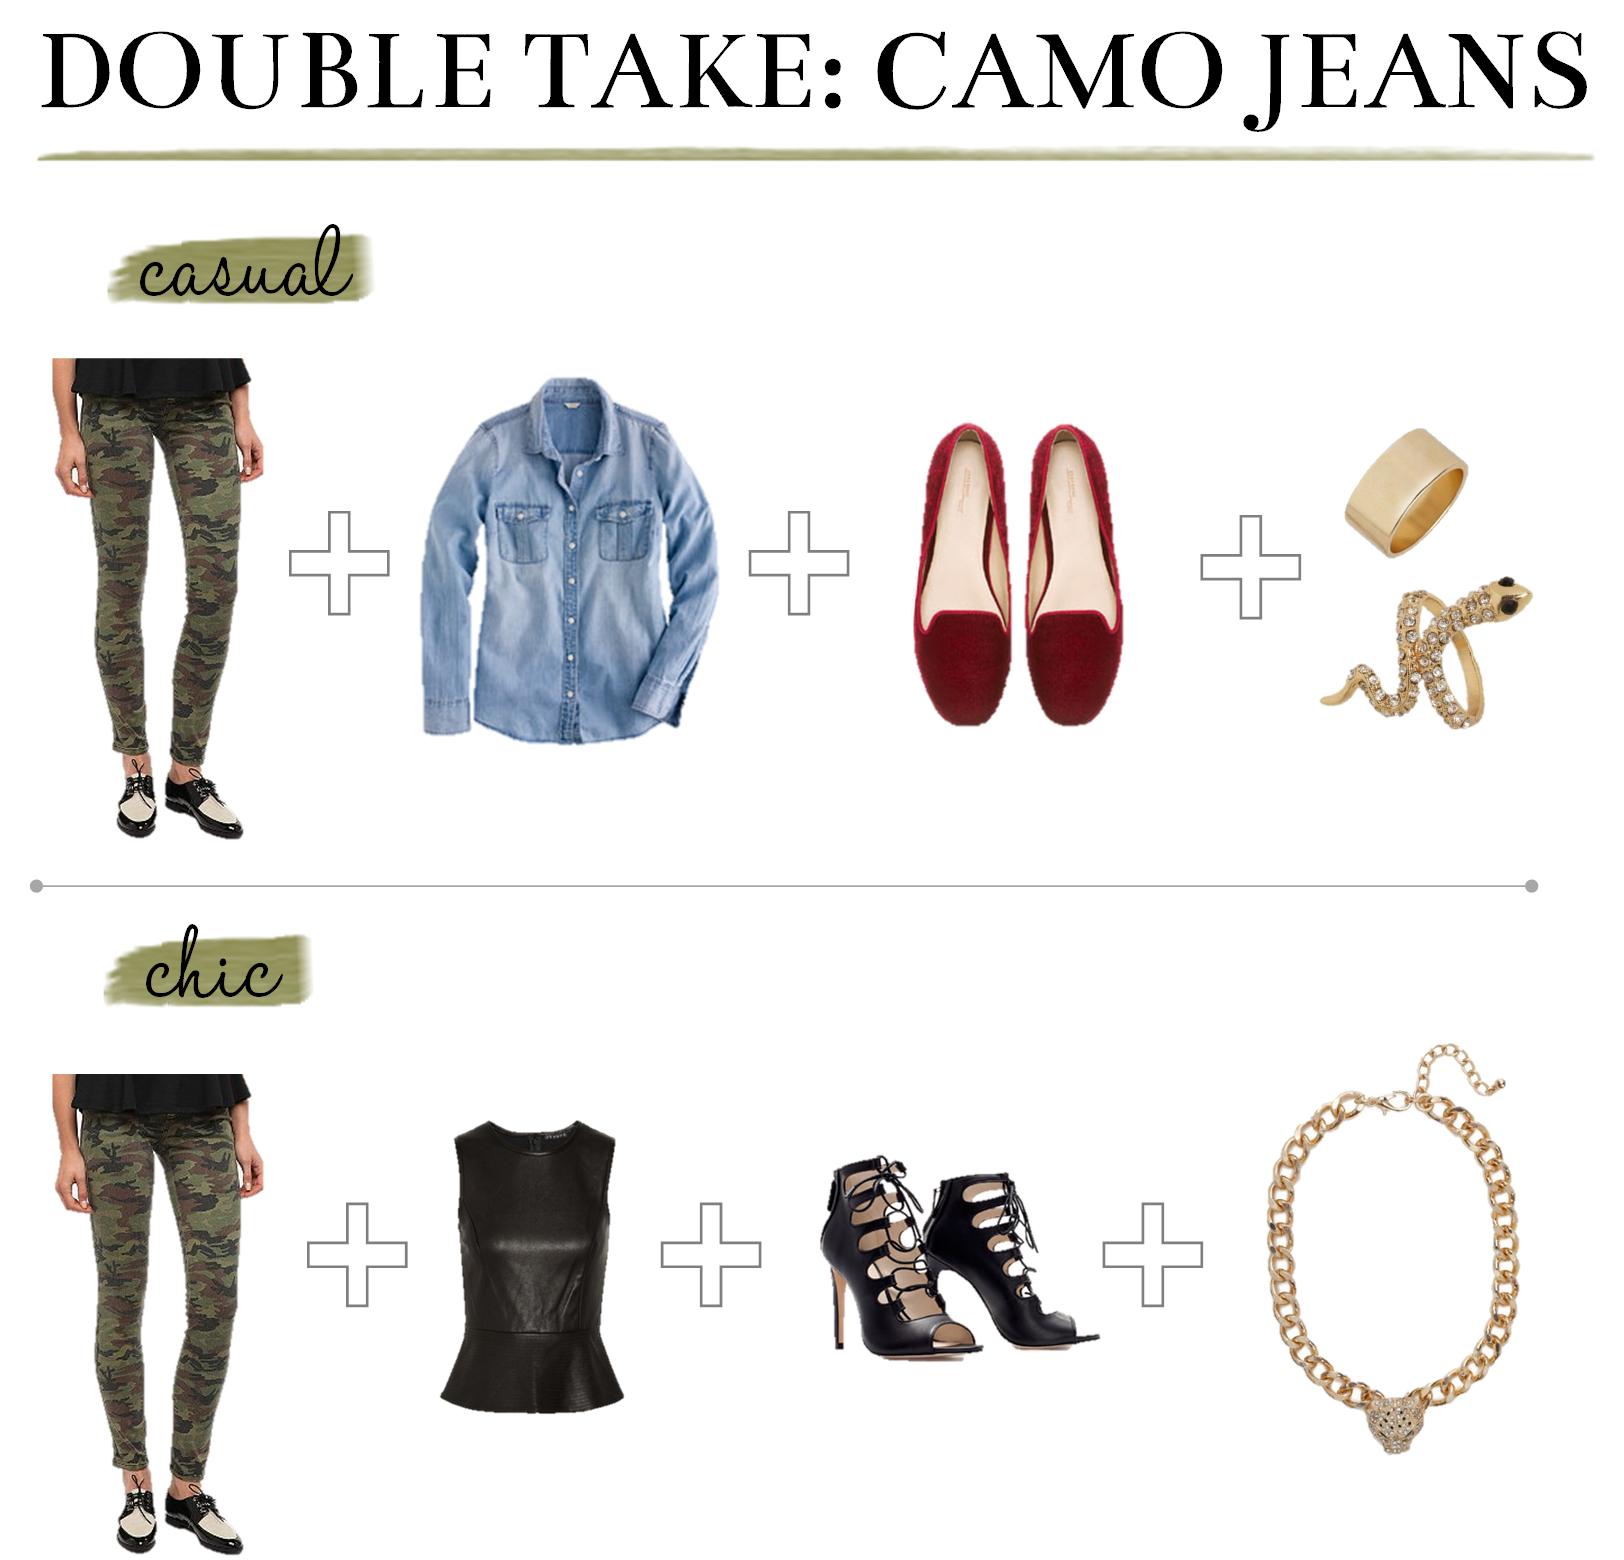 doubletake_camojeans